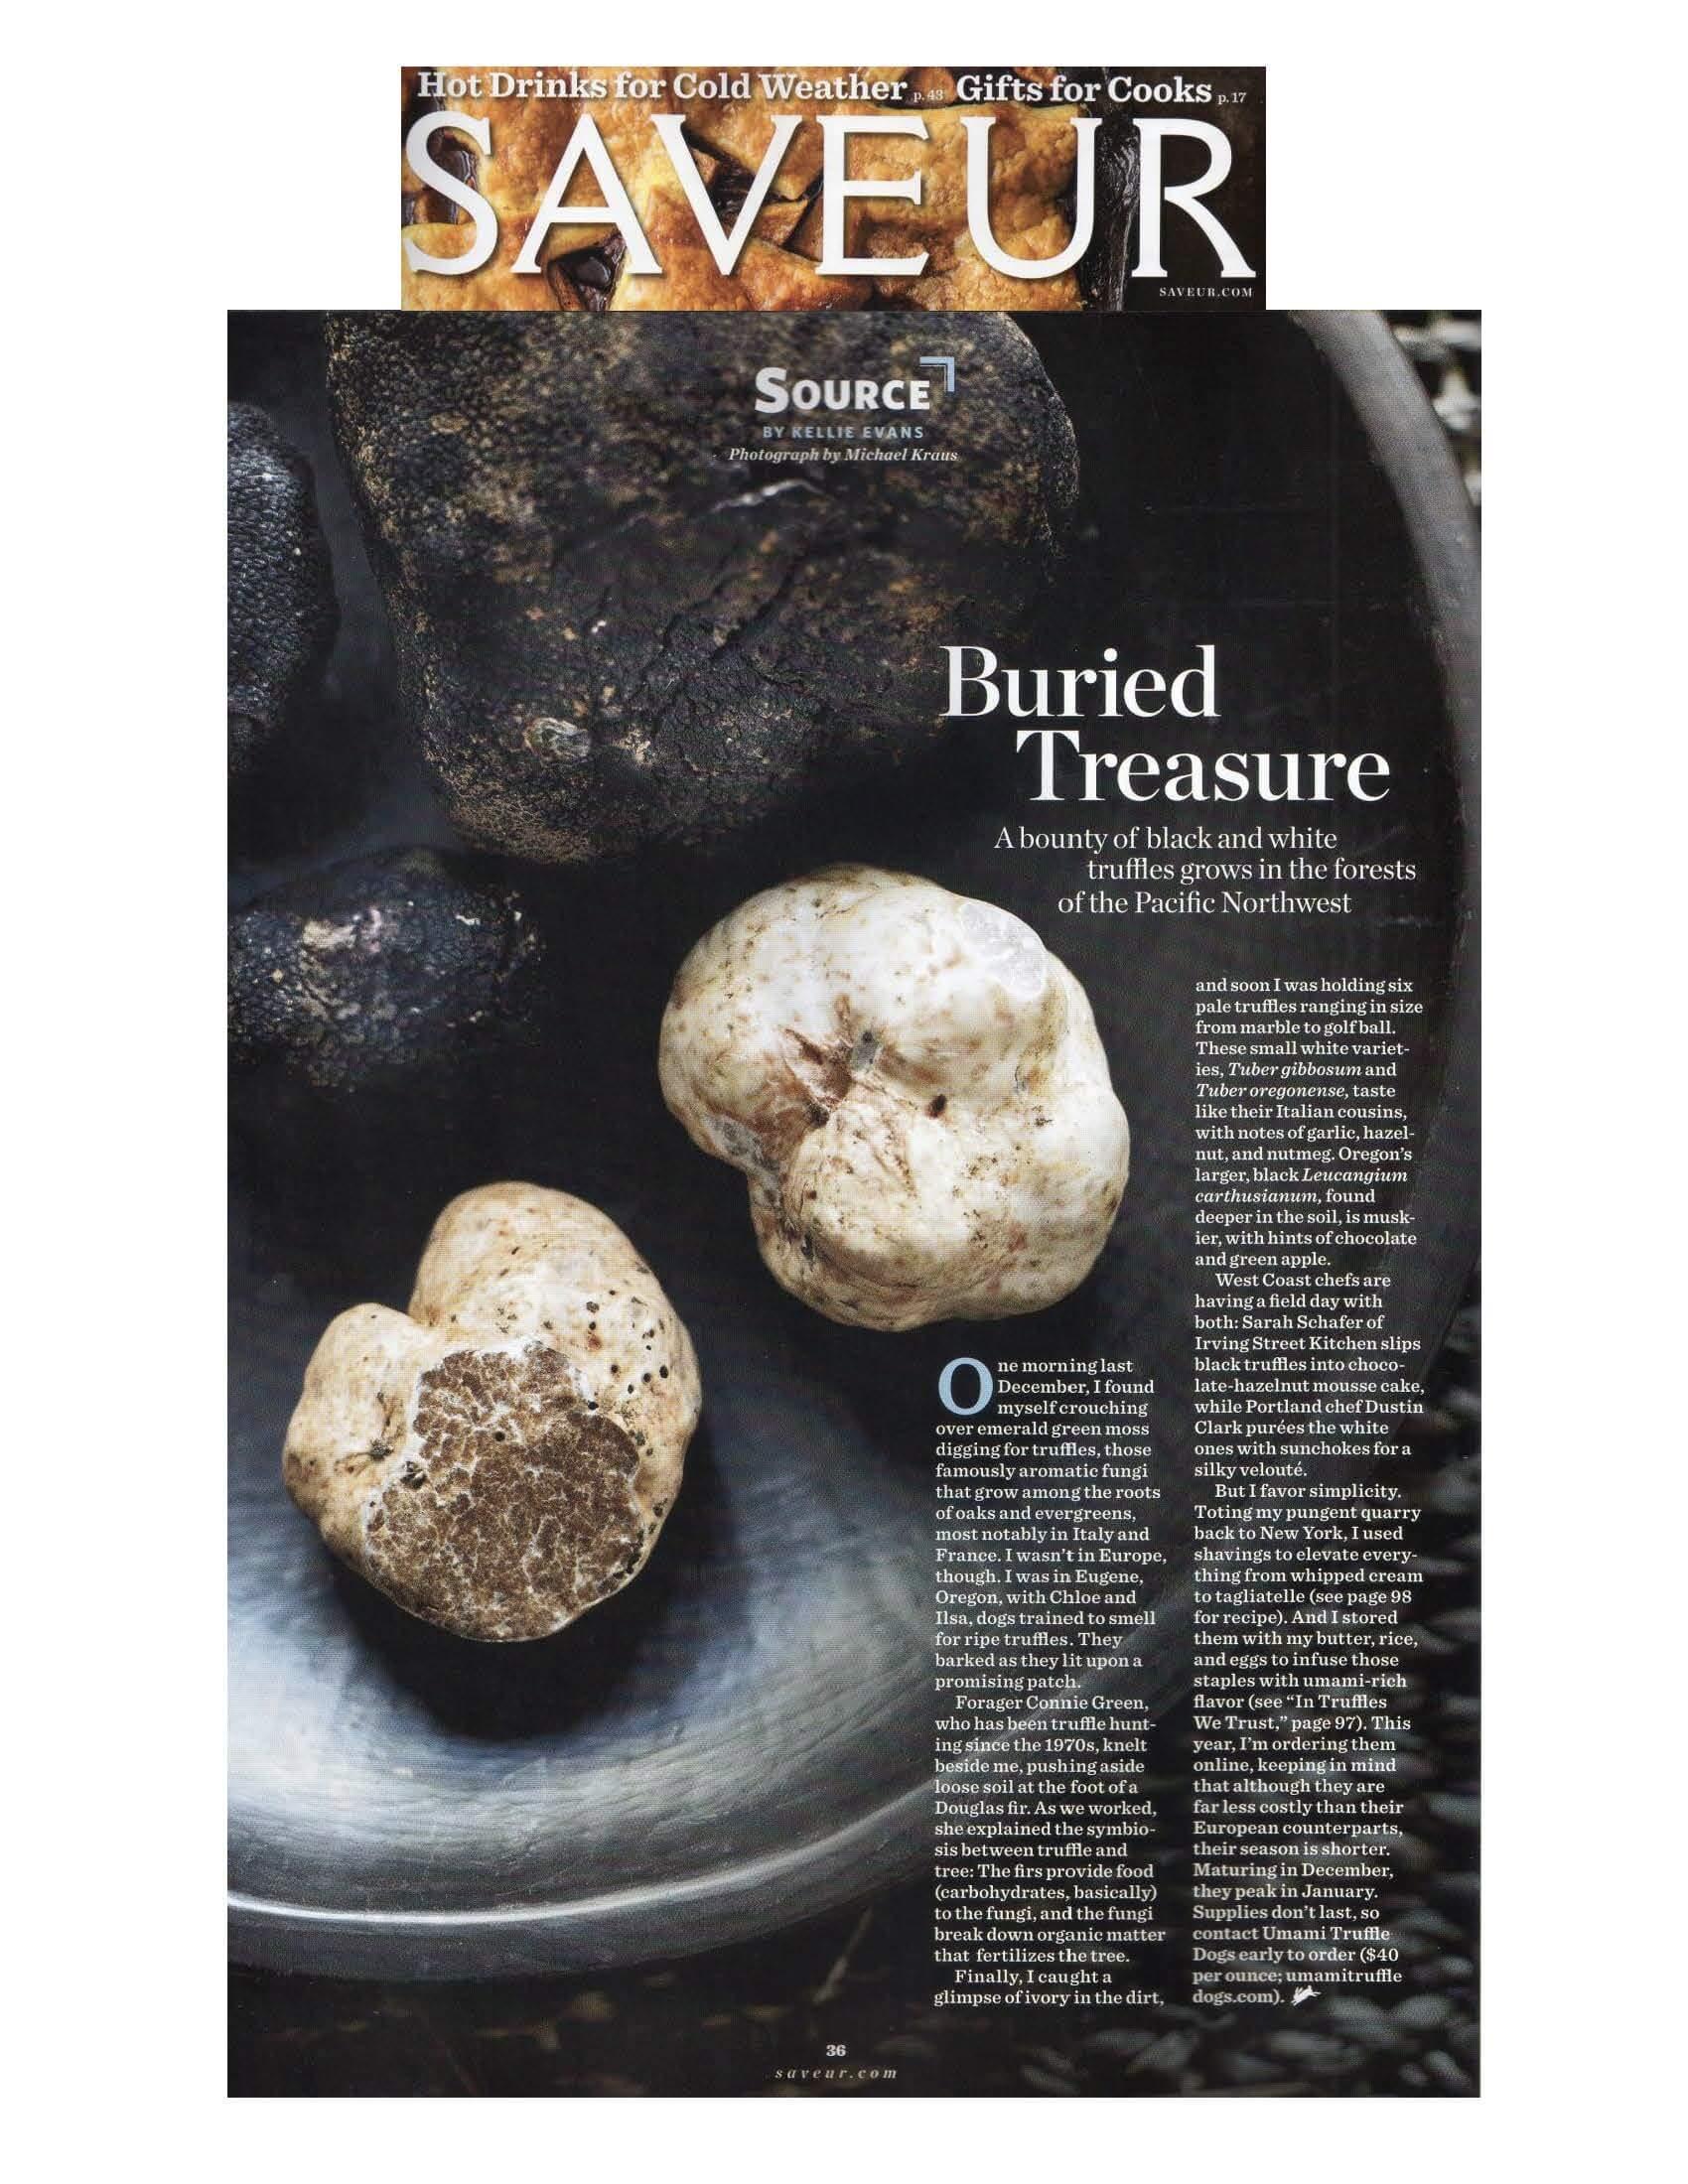 Saveur Dec 14 truffle hunt